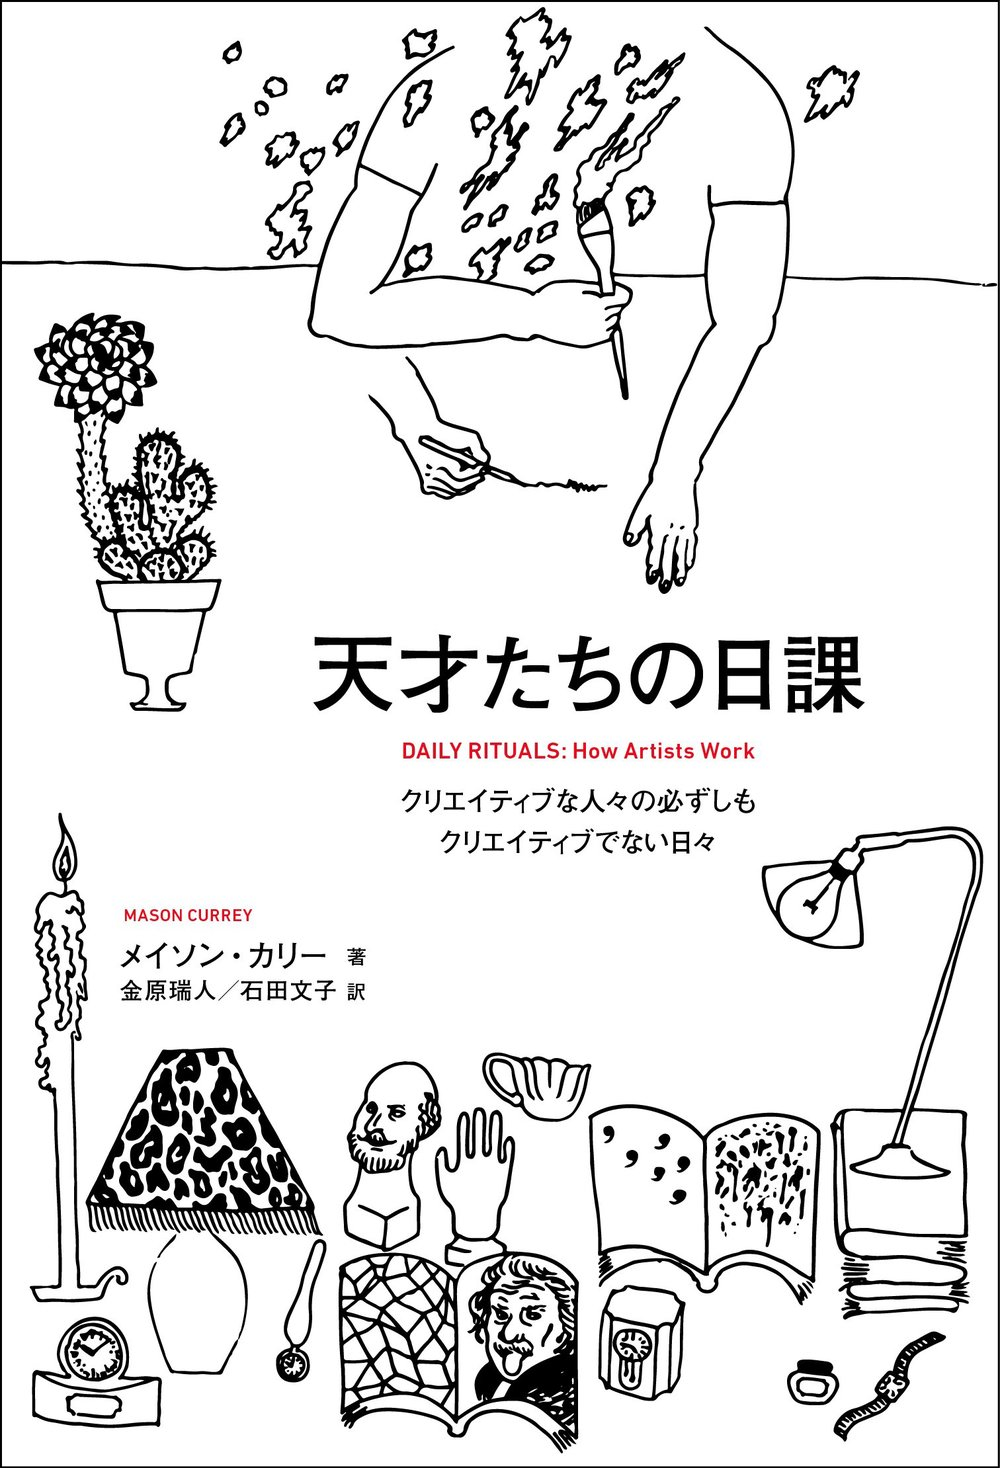 DailyRituals-Japanese.jpg